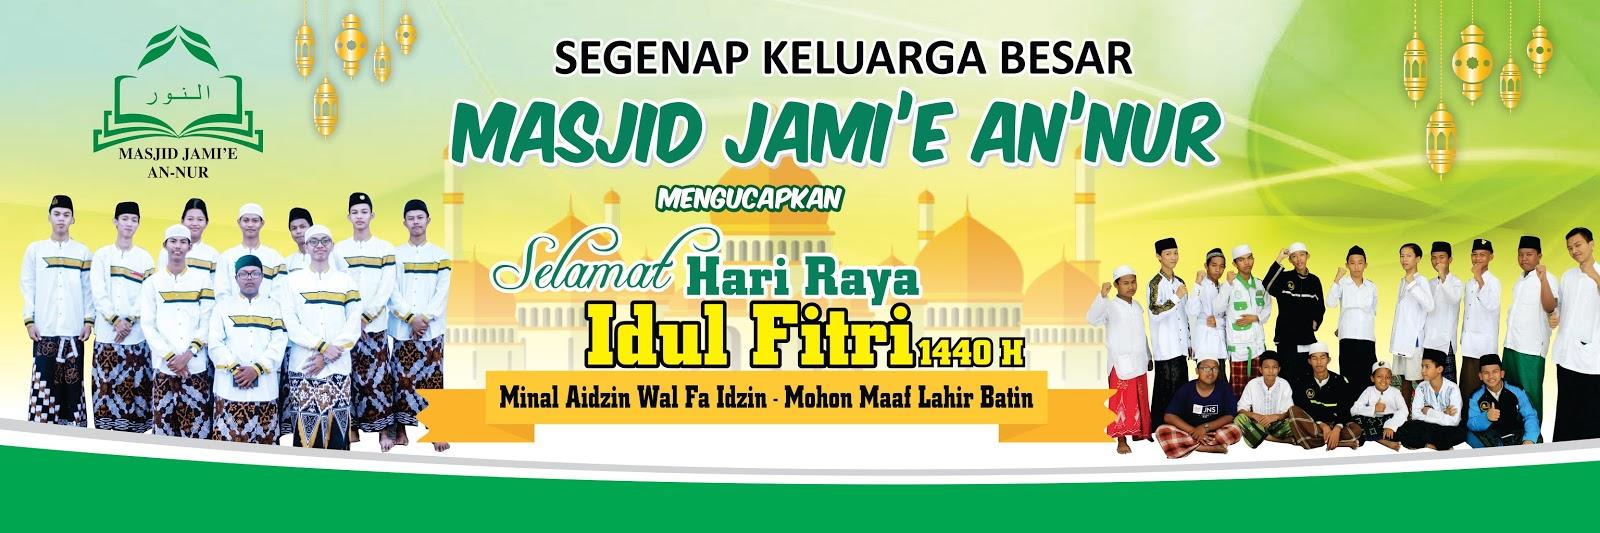 Banner Ucapan Selamat Hari Raya Idul Fitri Terbaru Jami E An Nur